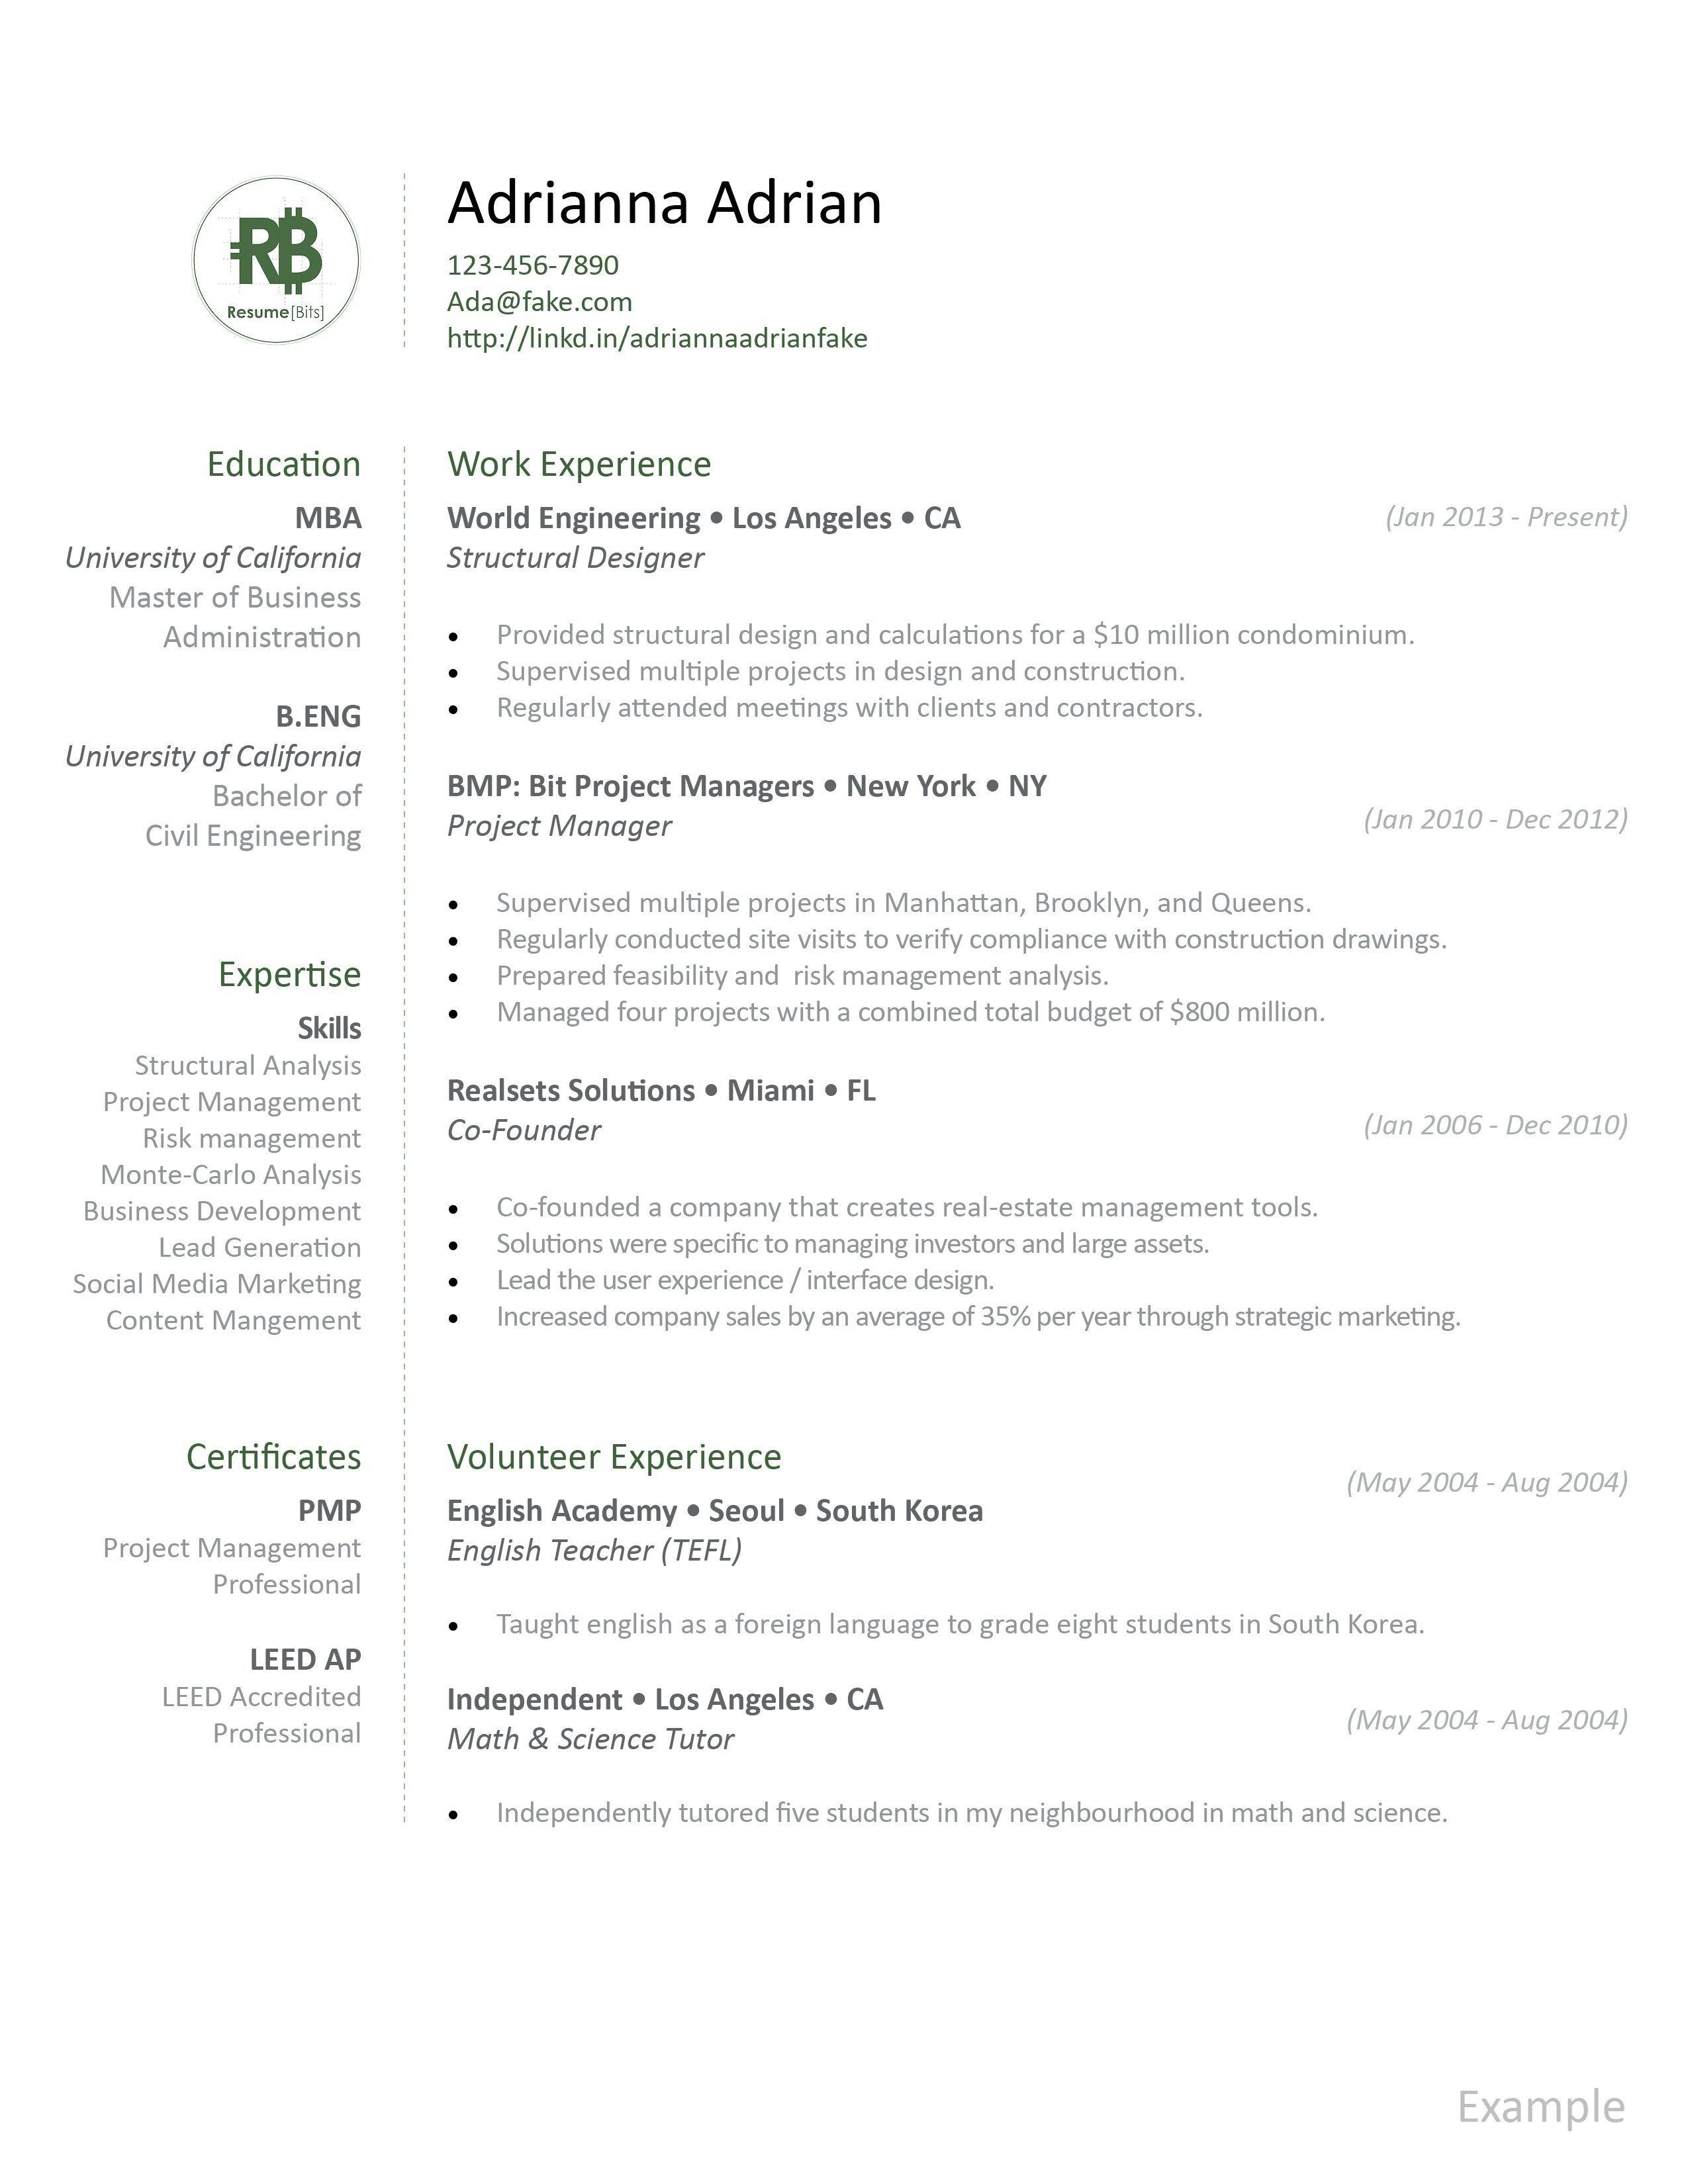 Resume Templates 2017 Reddit Resumetemplates Indesign Resume Template Resume Templates Cv Template